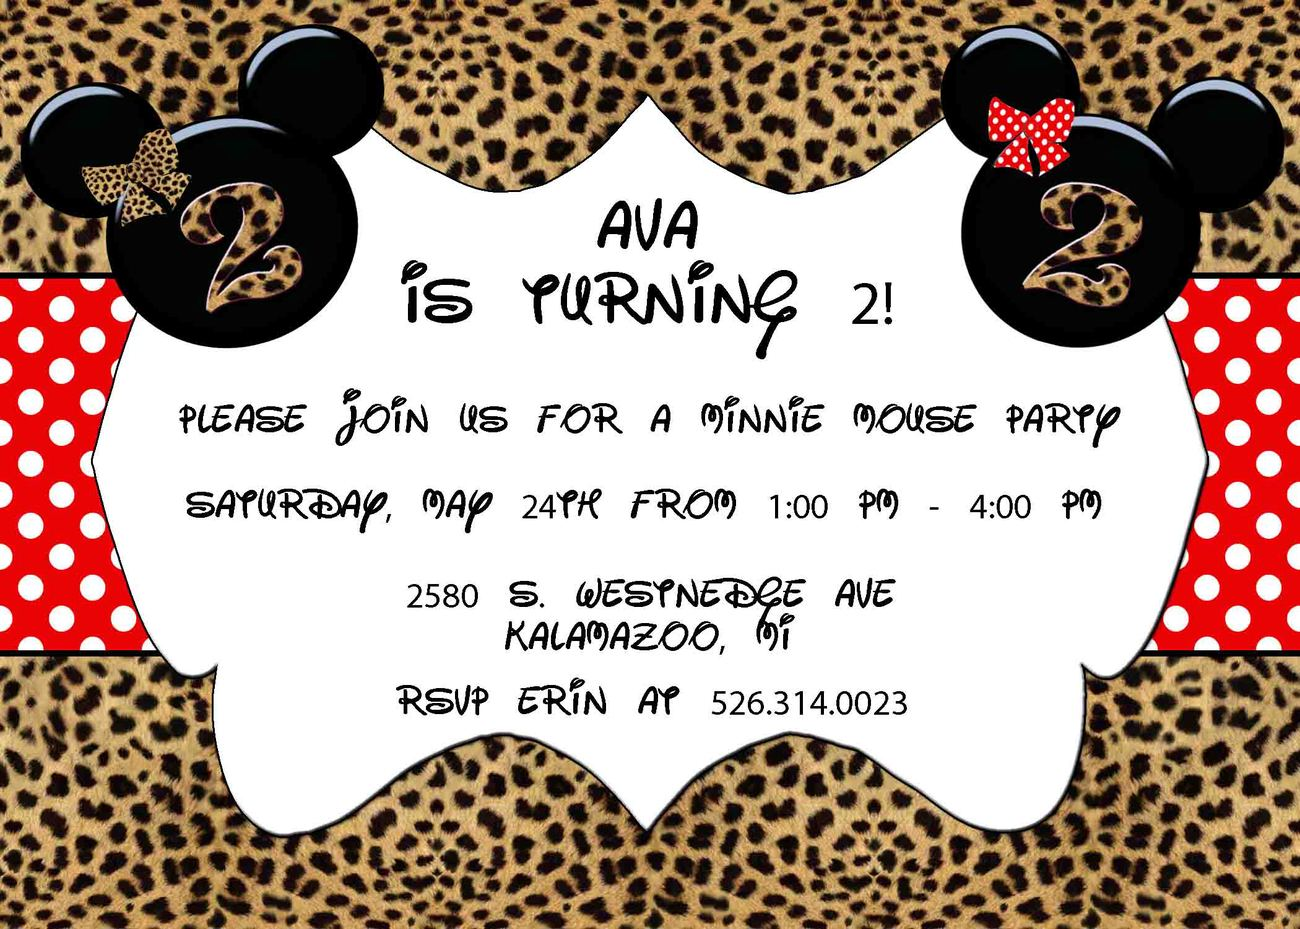 Custom Invitation with adorable invitation layout